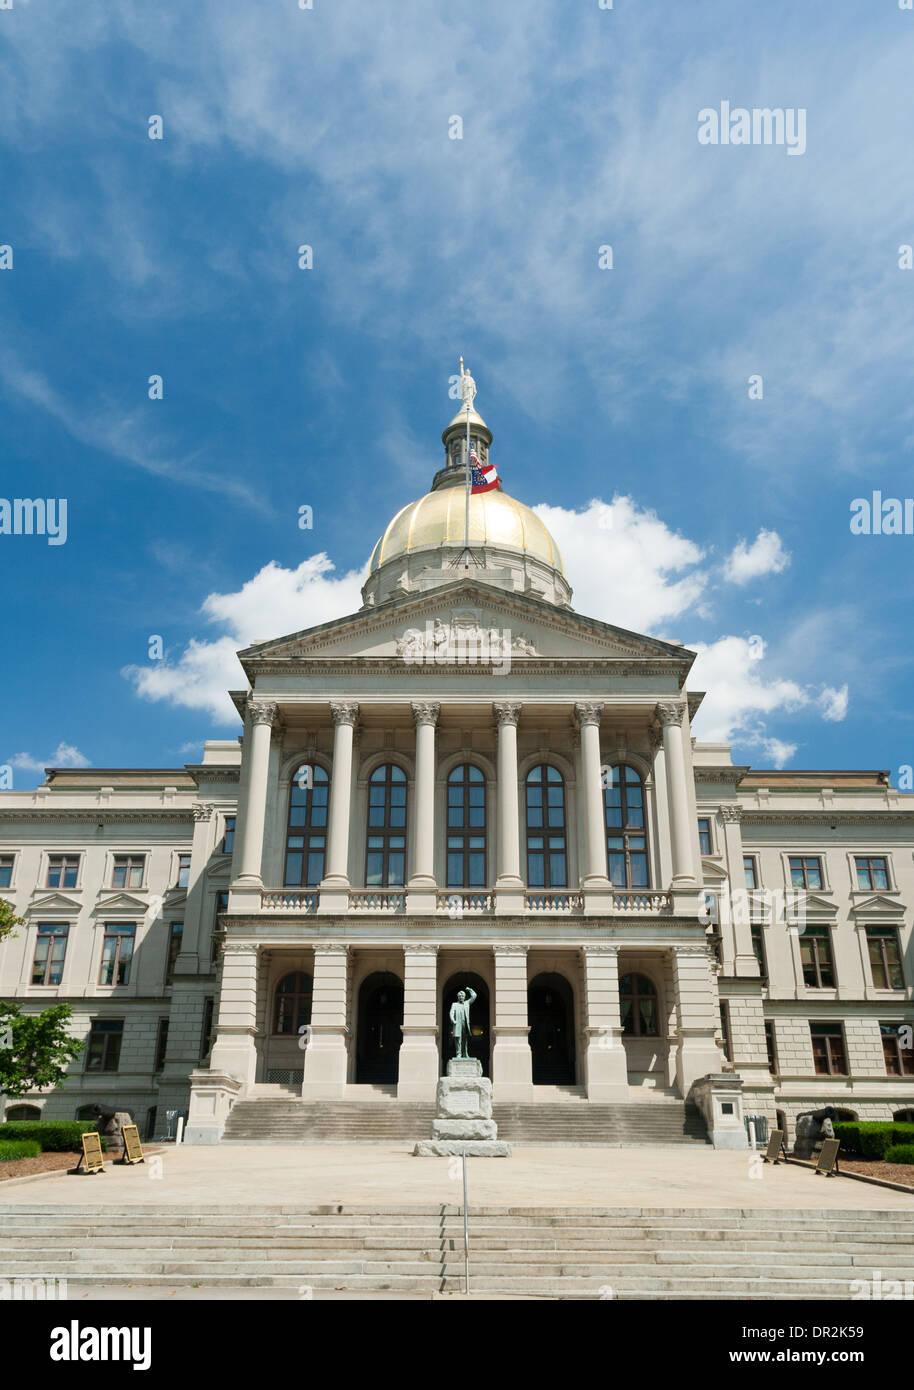 Georgia State Capitol Building, Atlanta, GA - Stock Image